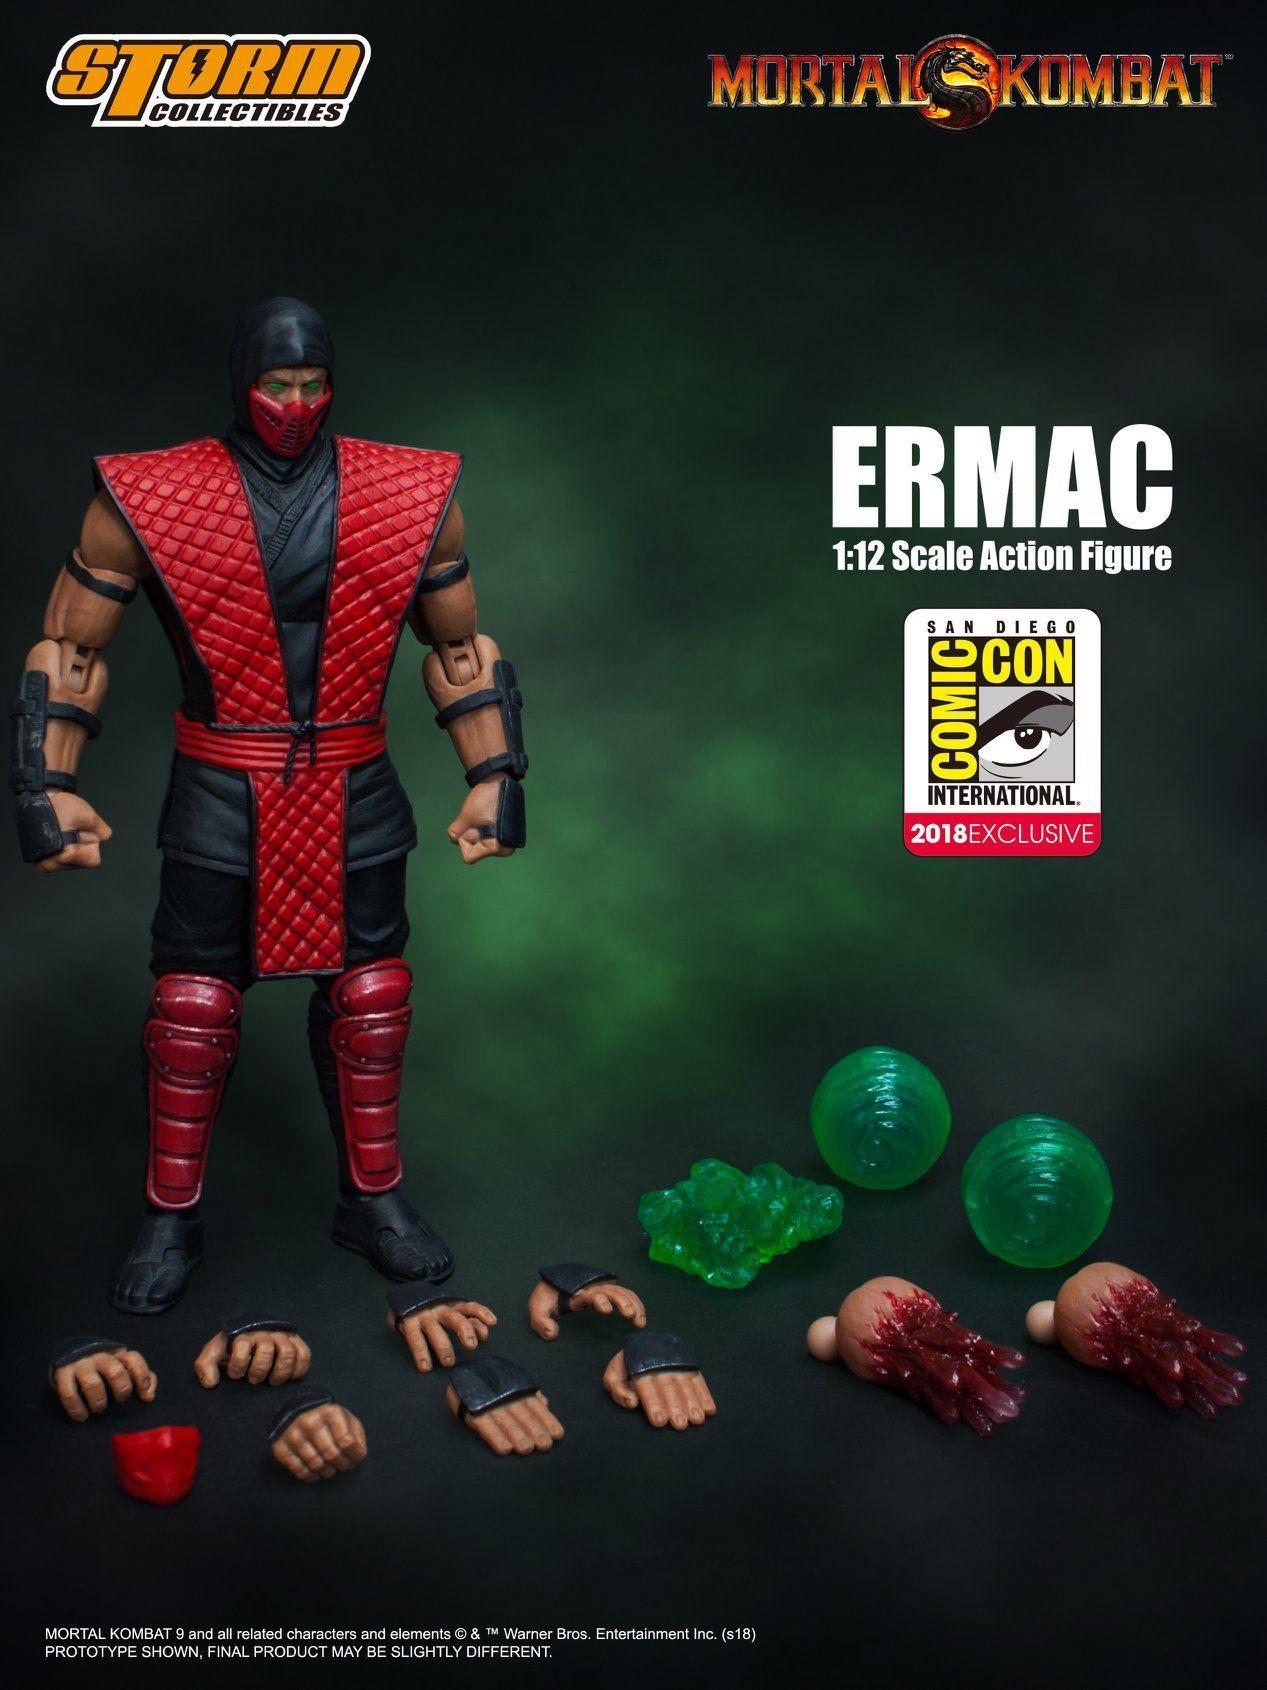 https://www.bleedingcool.com/wp-content/uploads/2018/06/Storm-Collectibles-Mortal-Kombat-Ermac-Exclusive-6.jpg#main